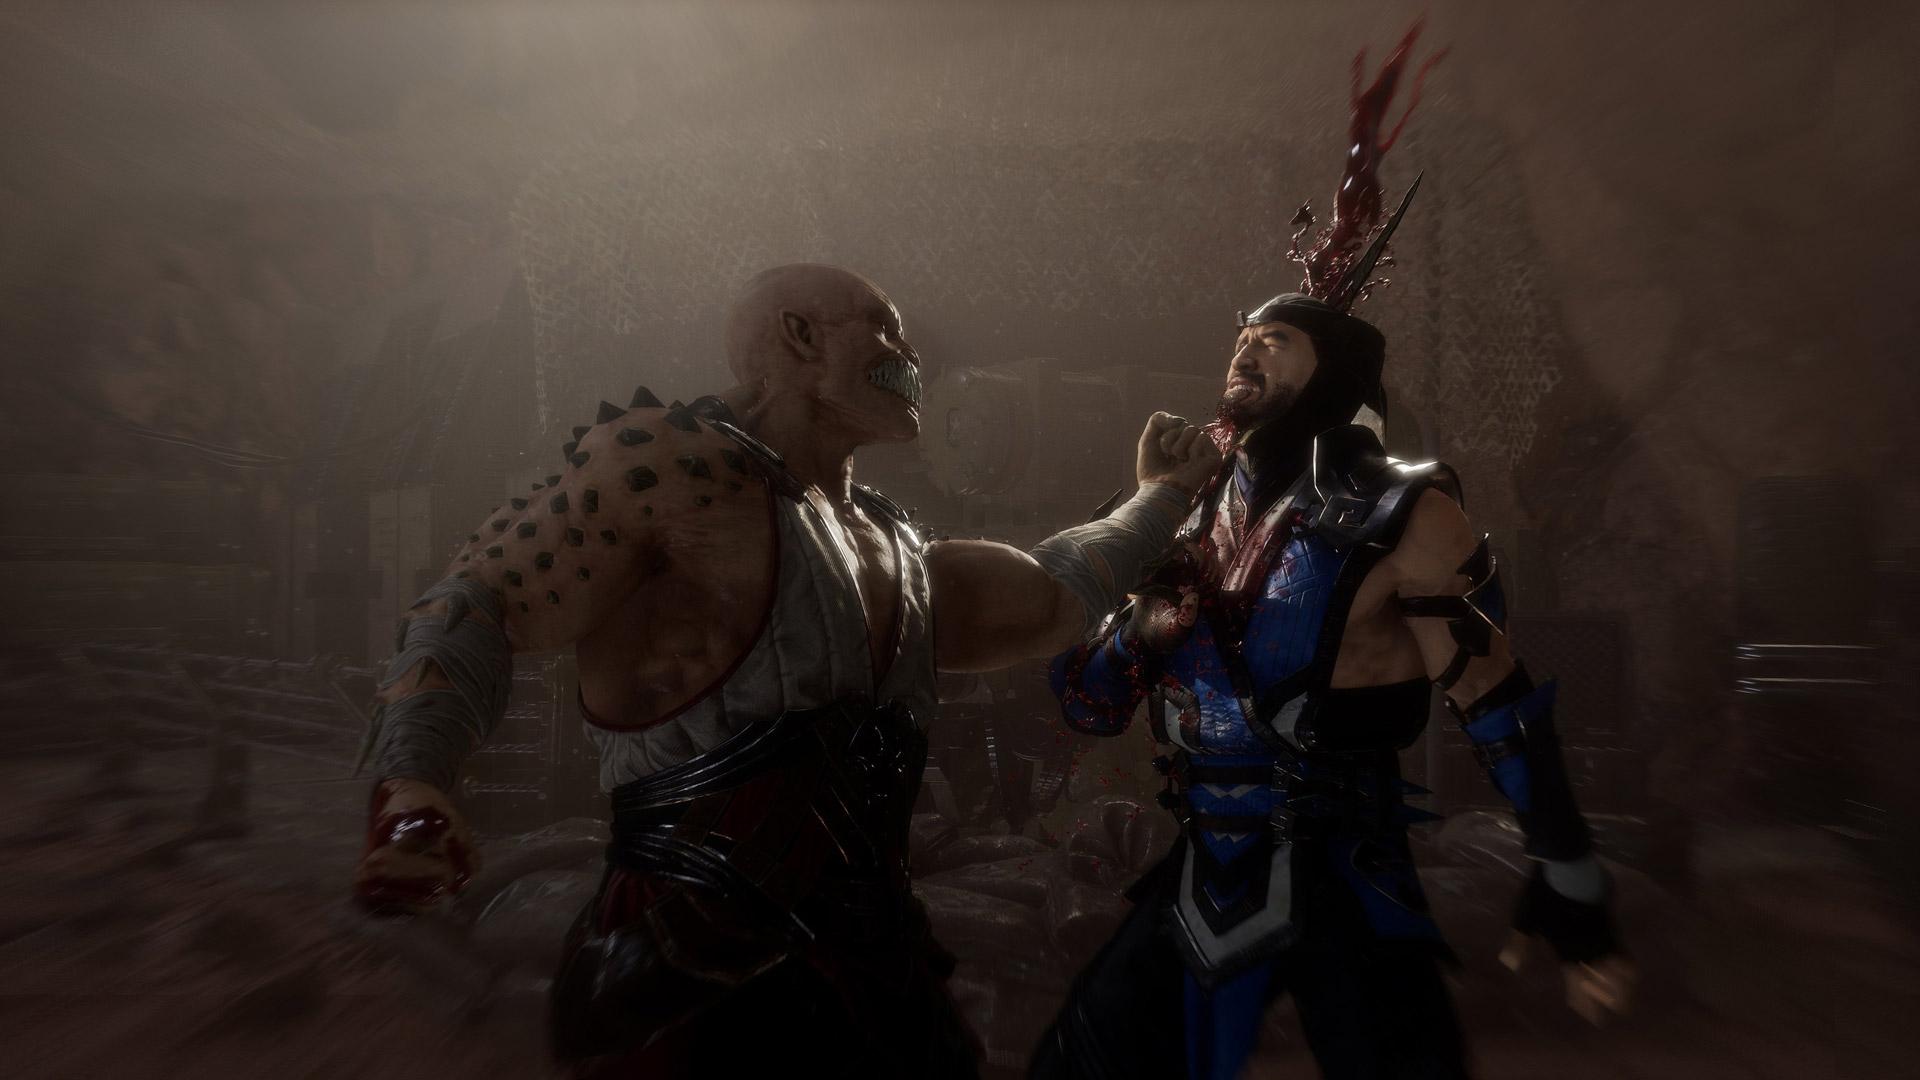 Mortal Kombat 11 Wallpaper in 1920x1080